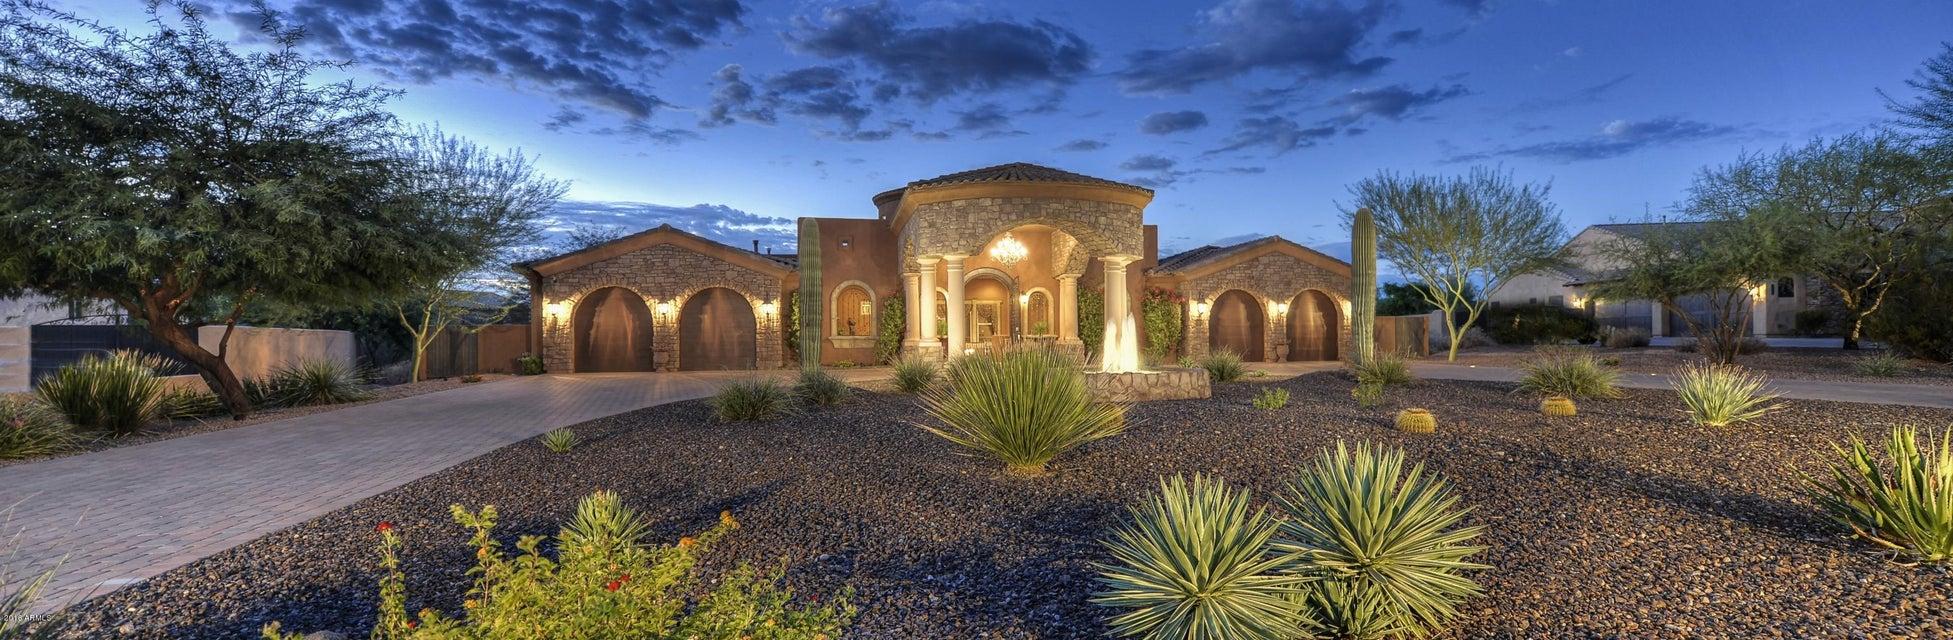 8214 E KAEL Street Mesa, AZ 85207 - MLS #: 5521628